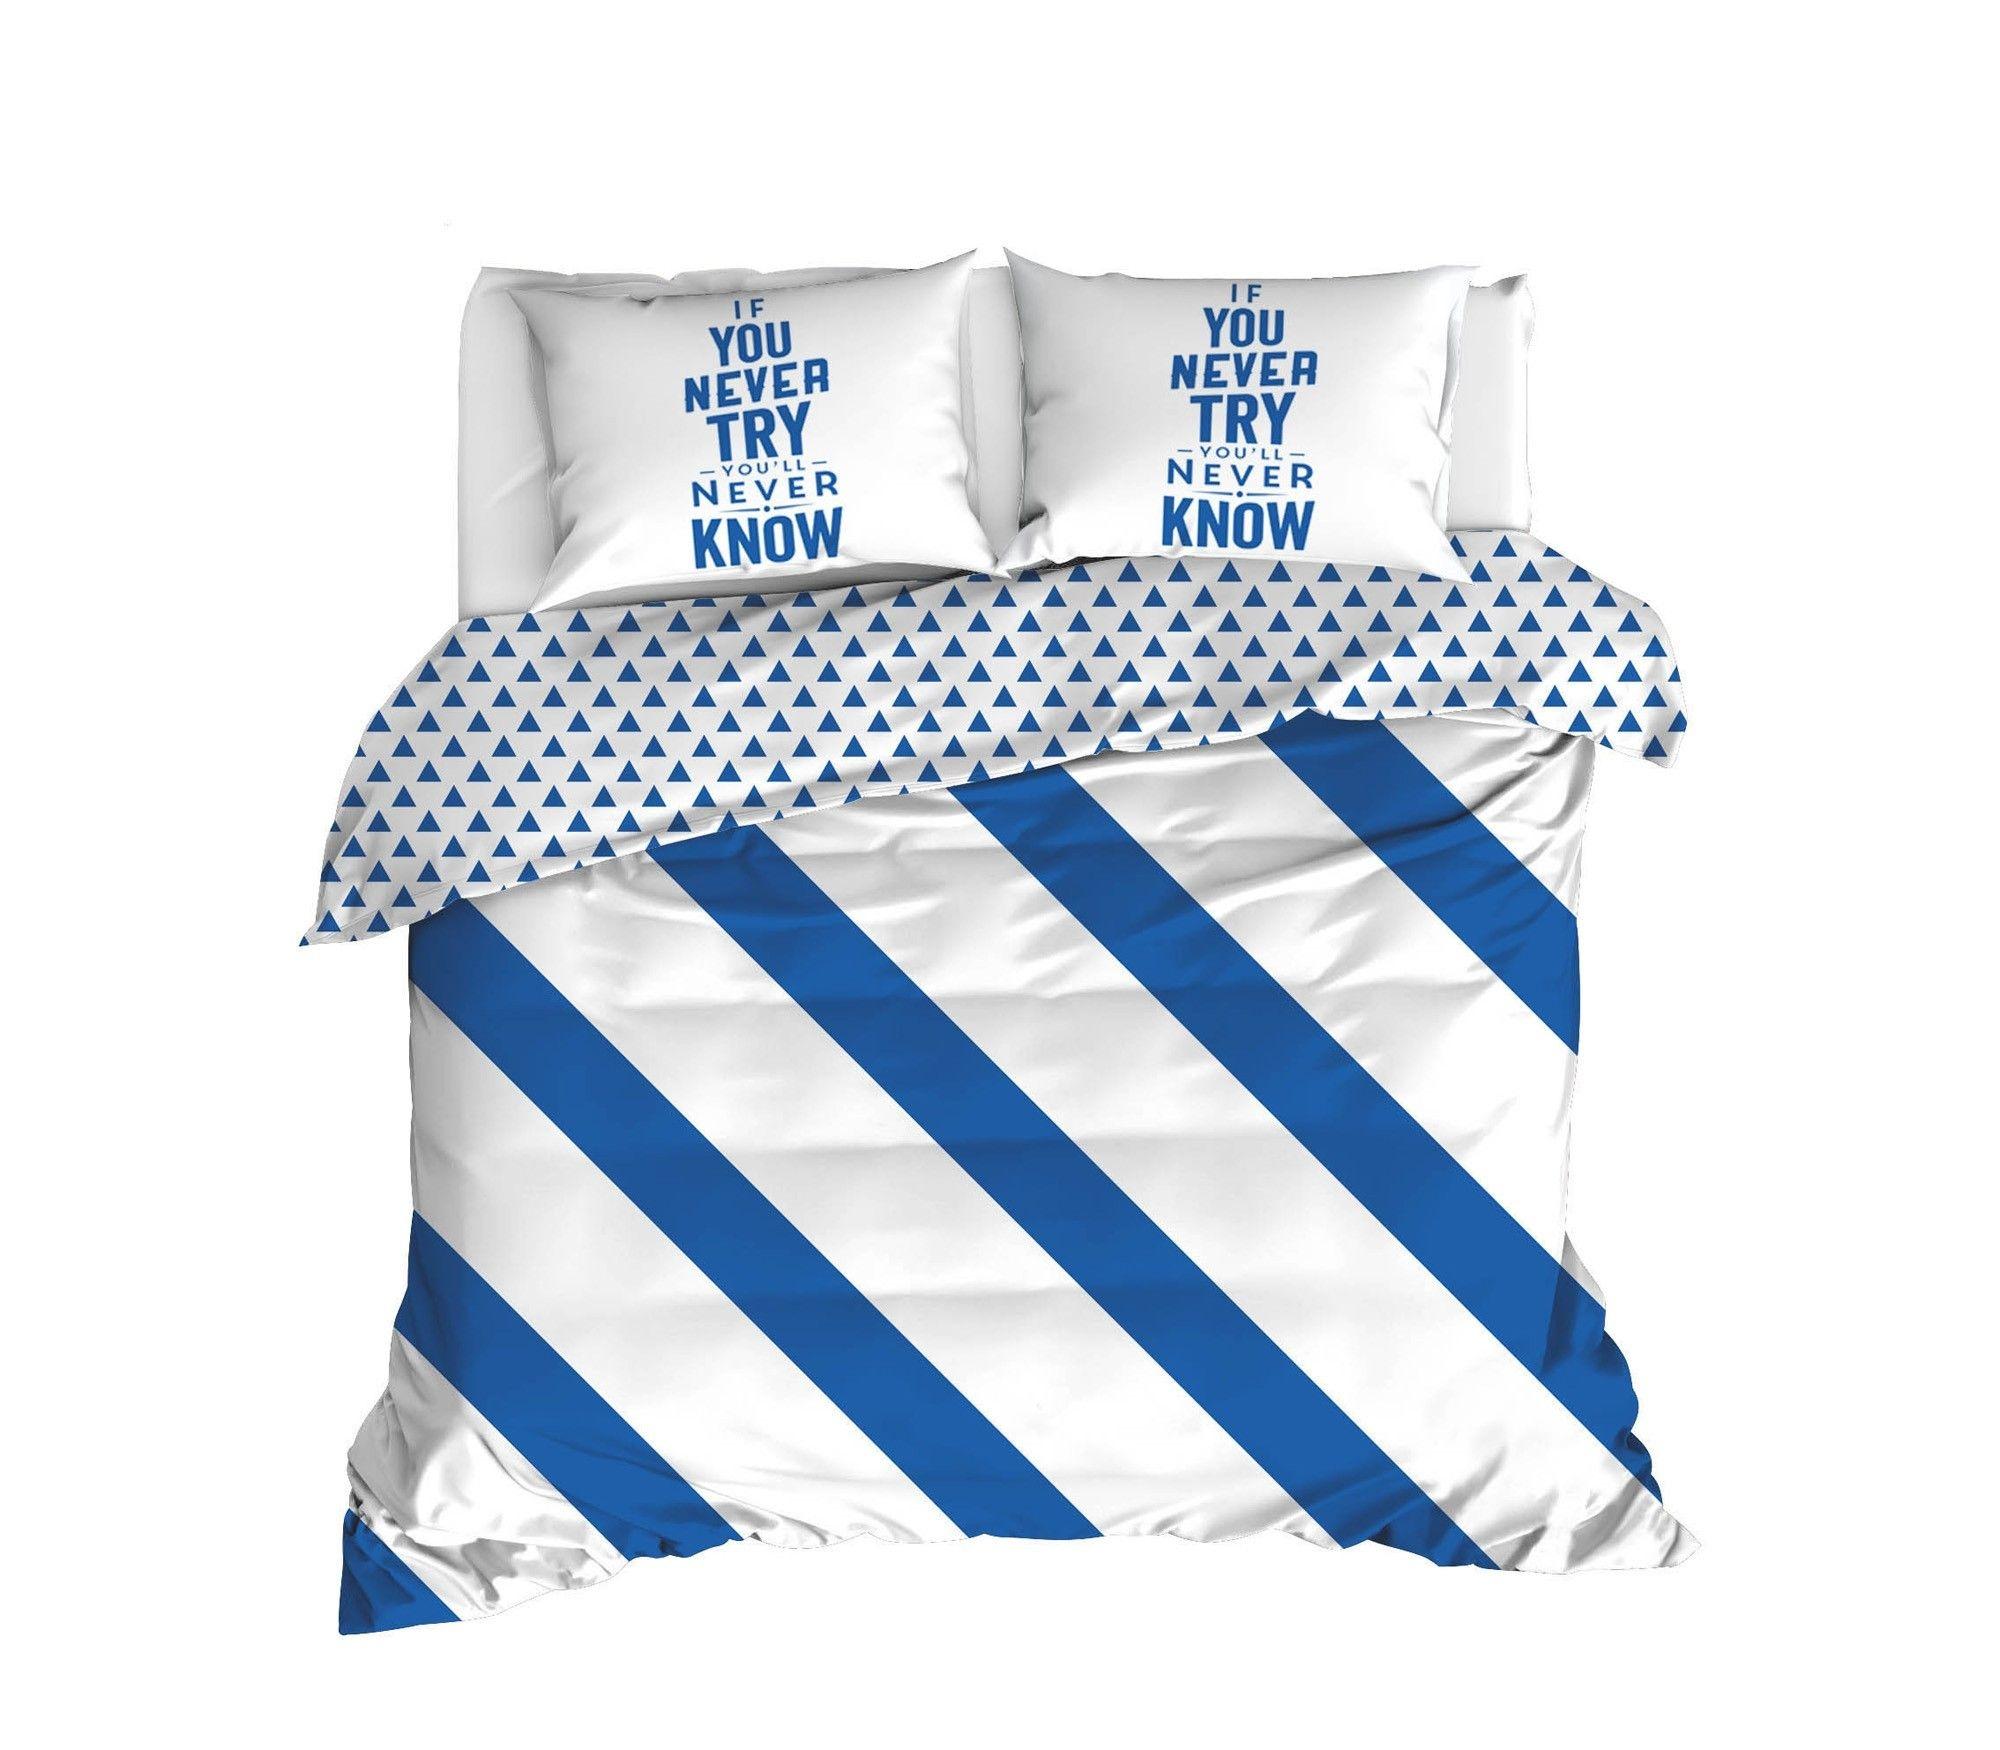 Lenjerie de pat din bumbac Ranforce, Erona Alb / Albastru, 200 x 220 cm